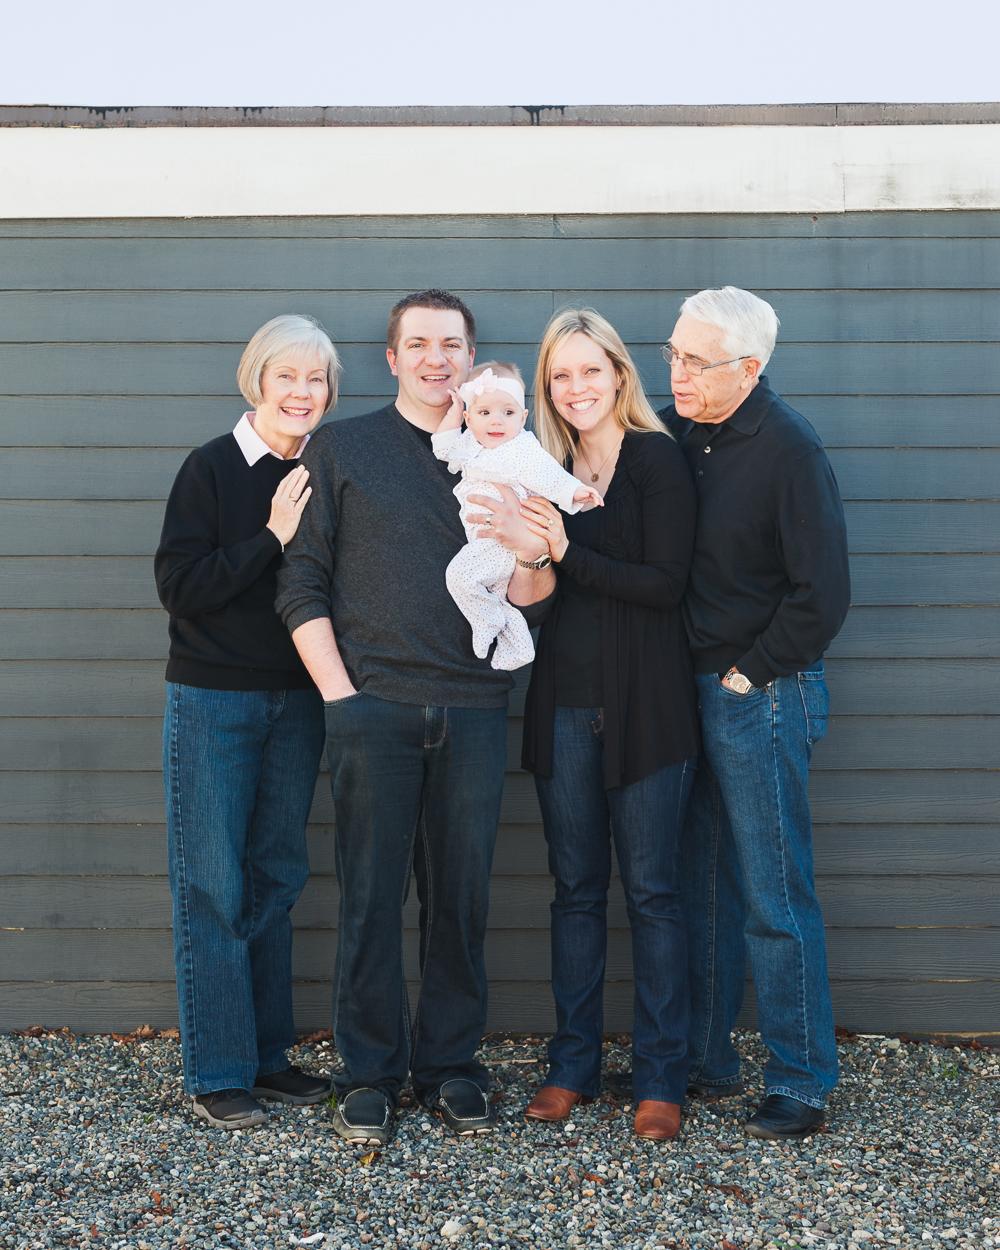 seattlefamilyphotographer.jpg